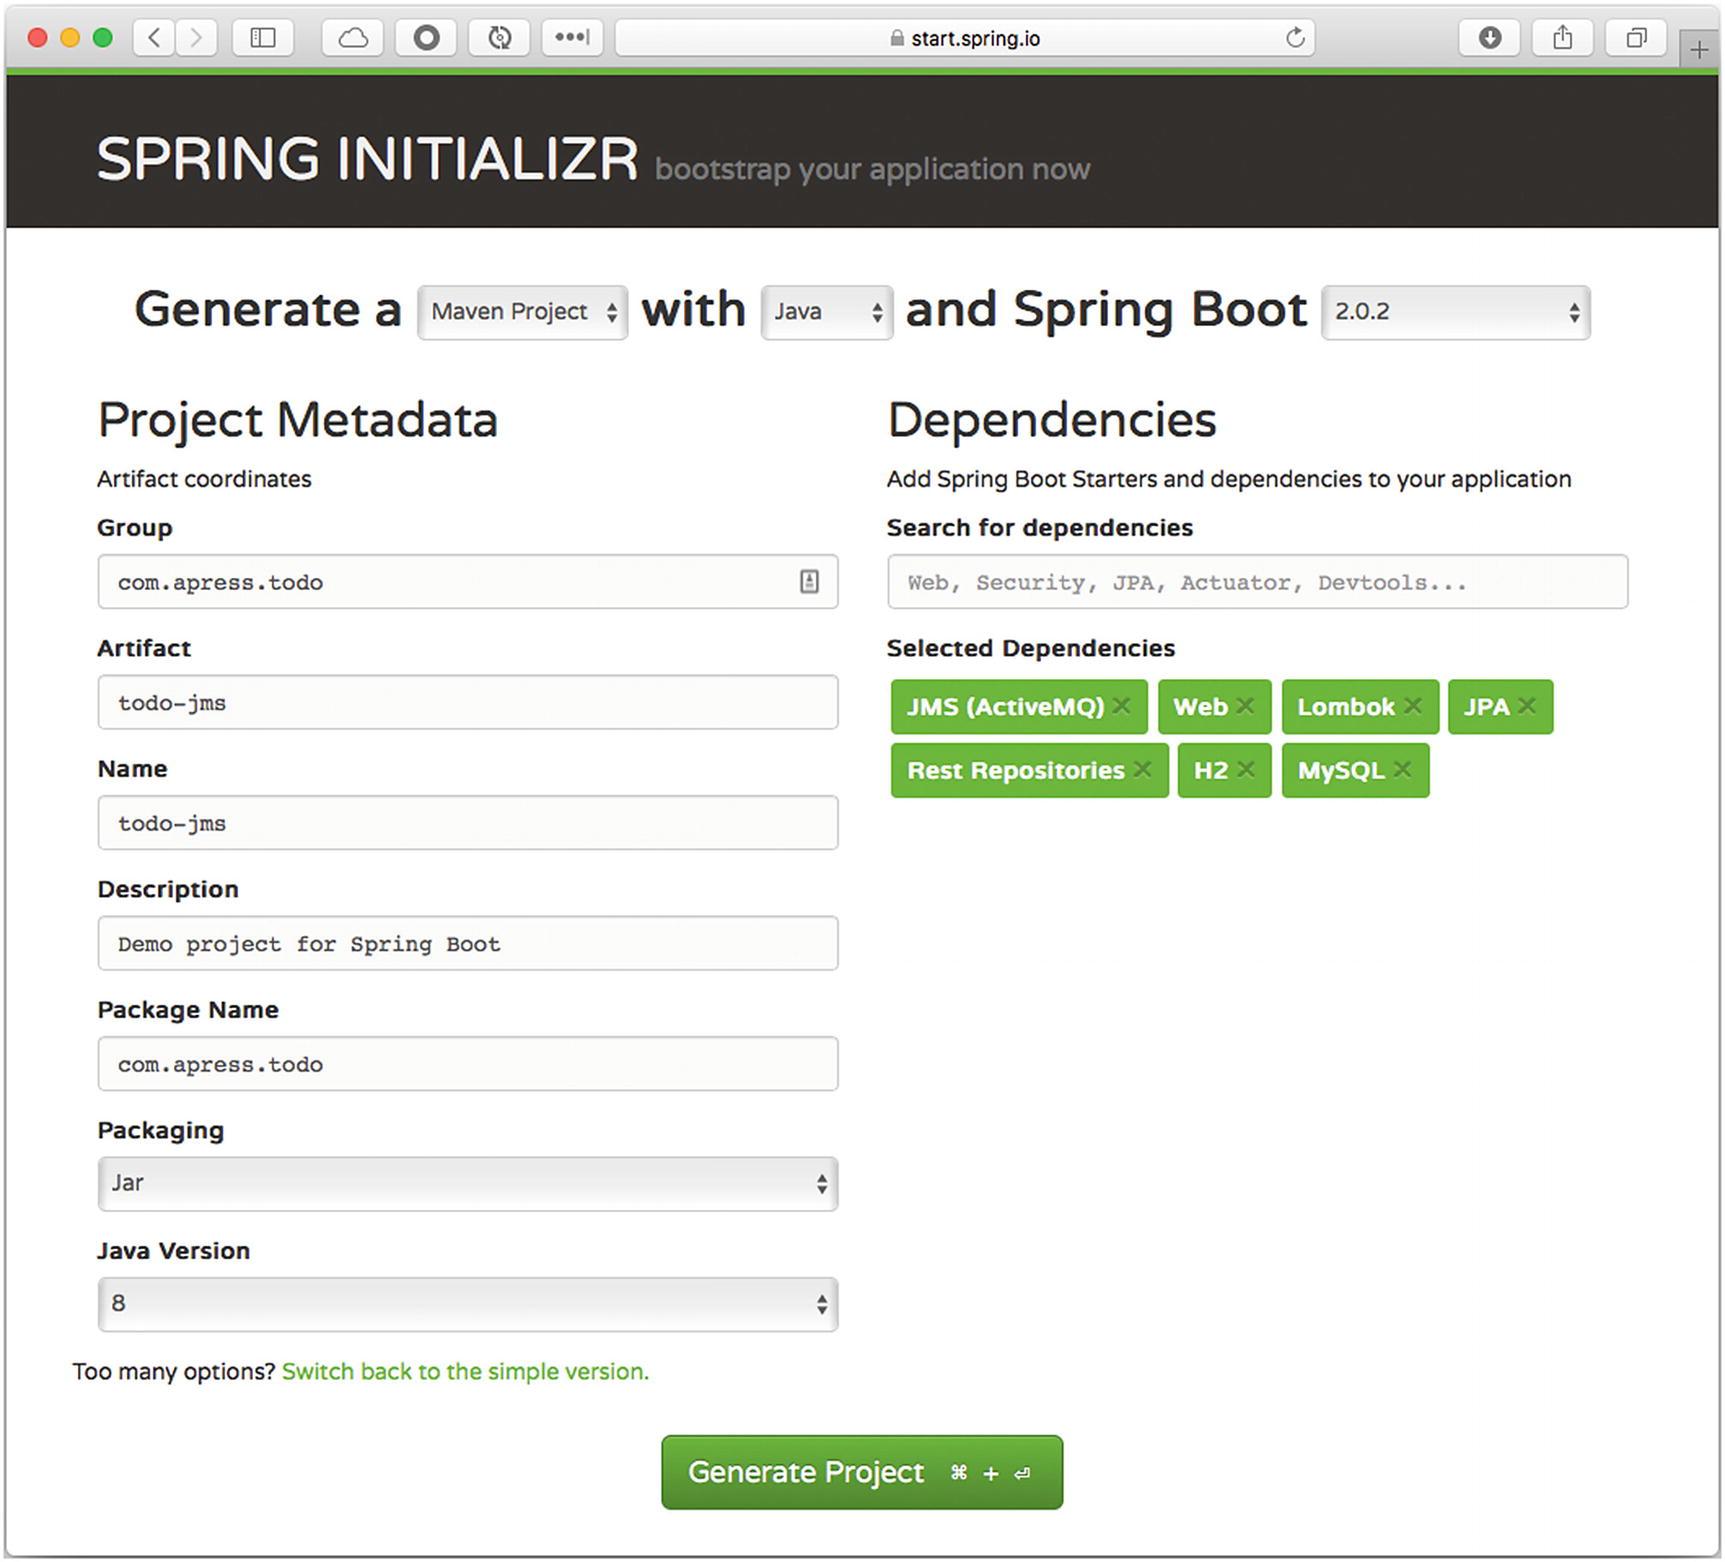 Messaging with Spring Boot | SpringerLink